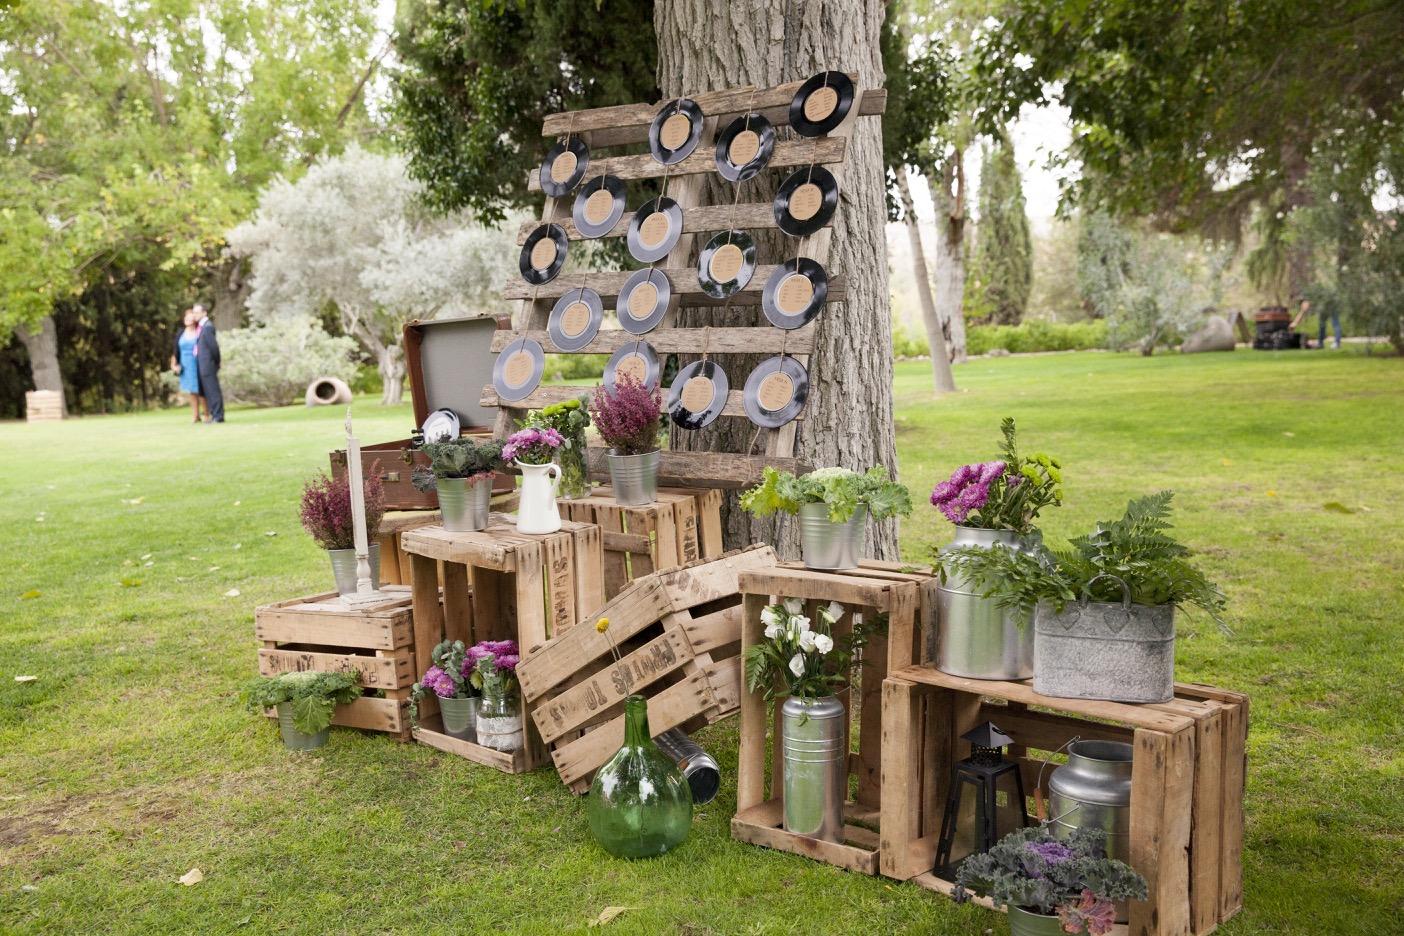 Colores de boda seating plan palets vinilos damajuanas for Decoracion de pared para novios